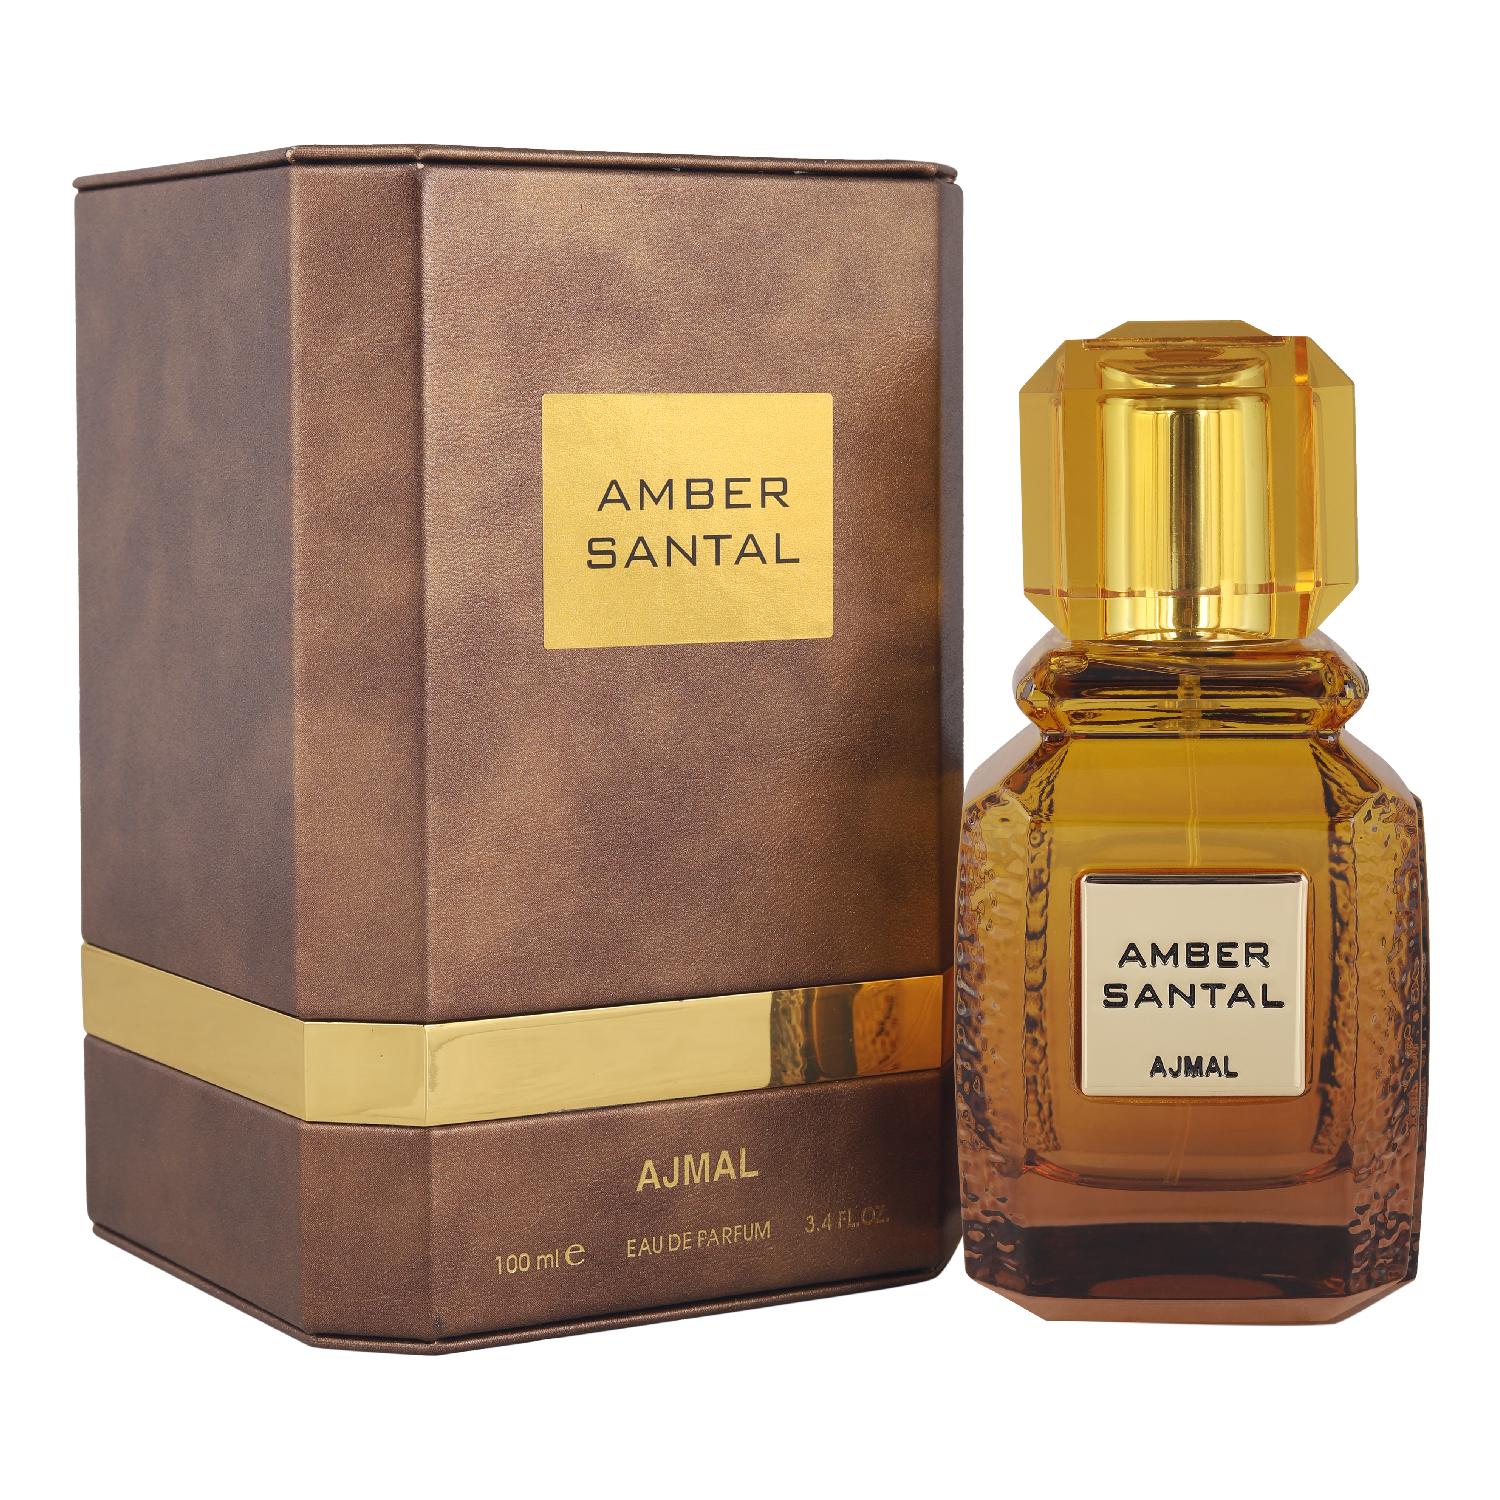 Ajmal | Ajmal Amber Santal Eau De Parfum 100ml Perfume for Men & Women + 2 Parfum Testers